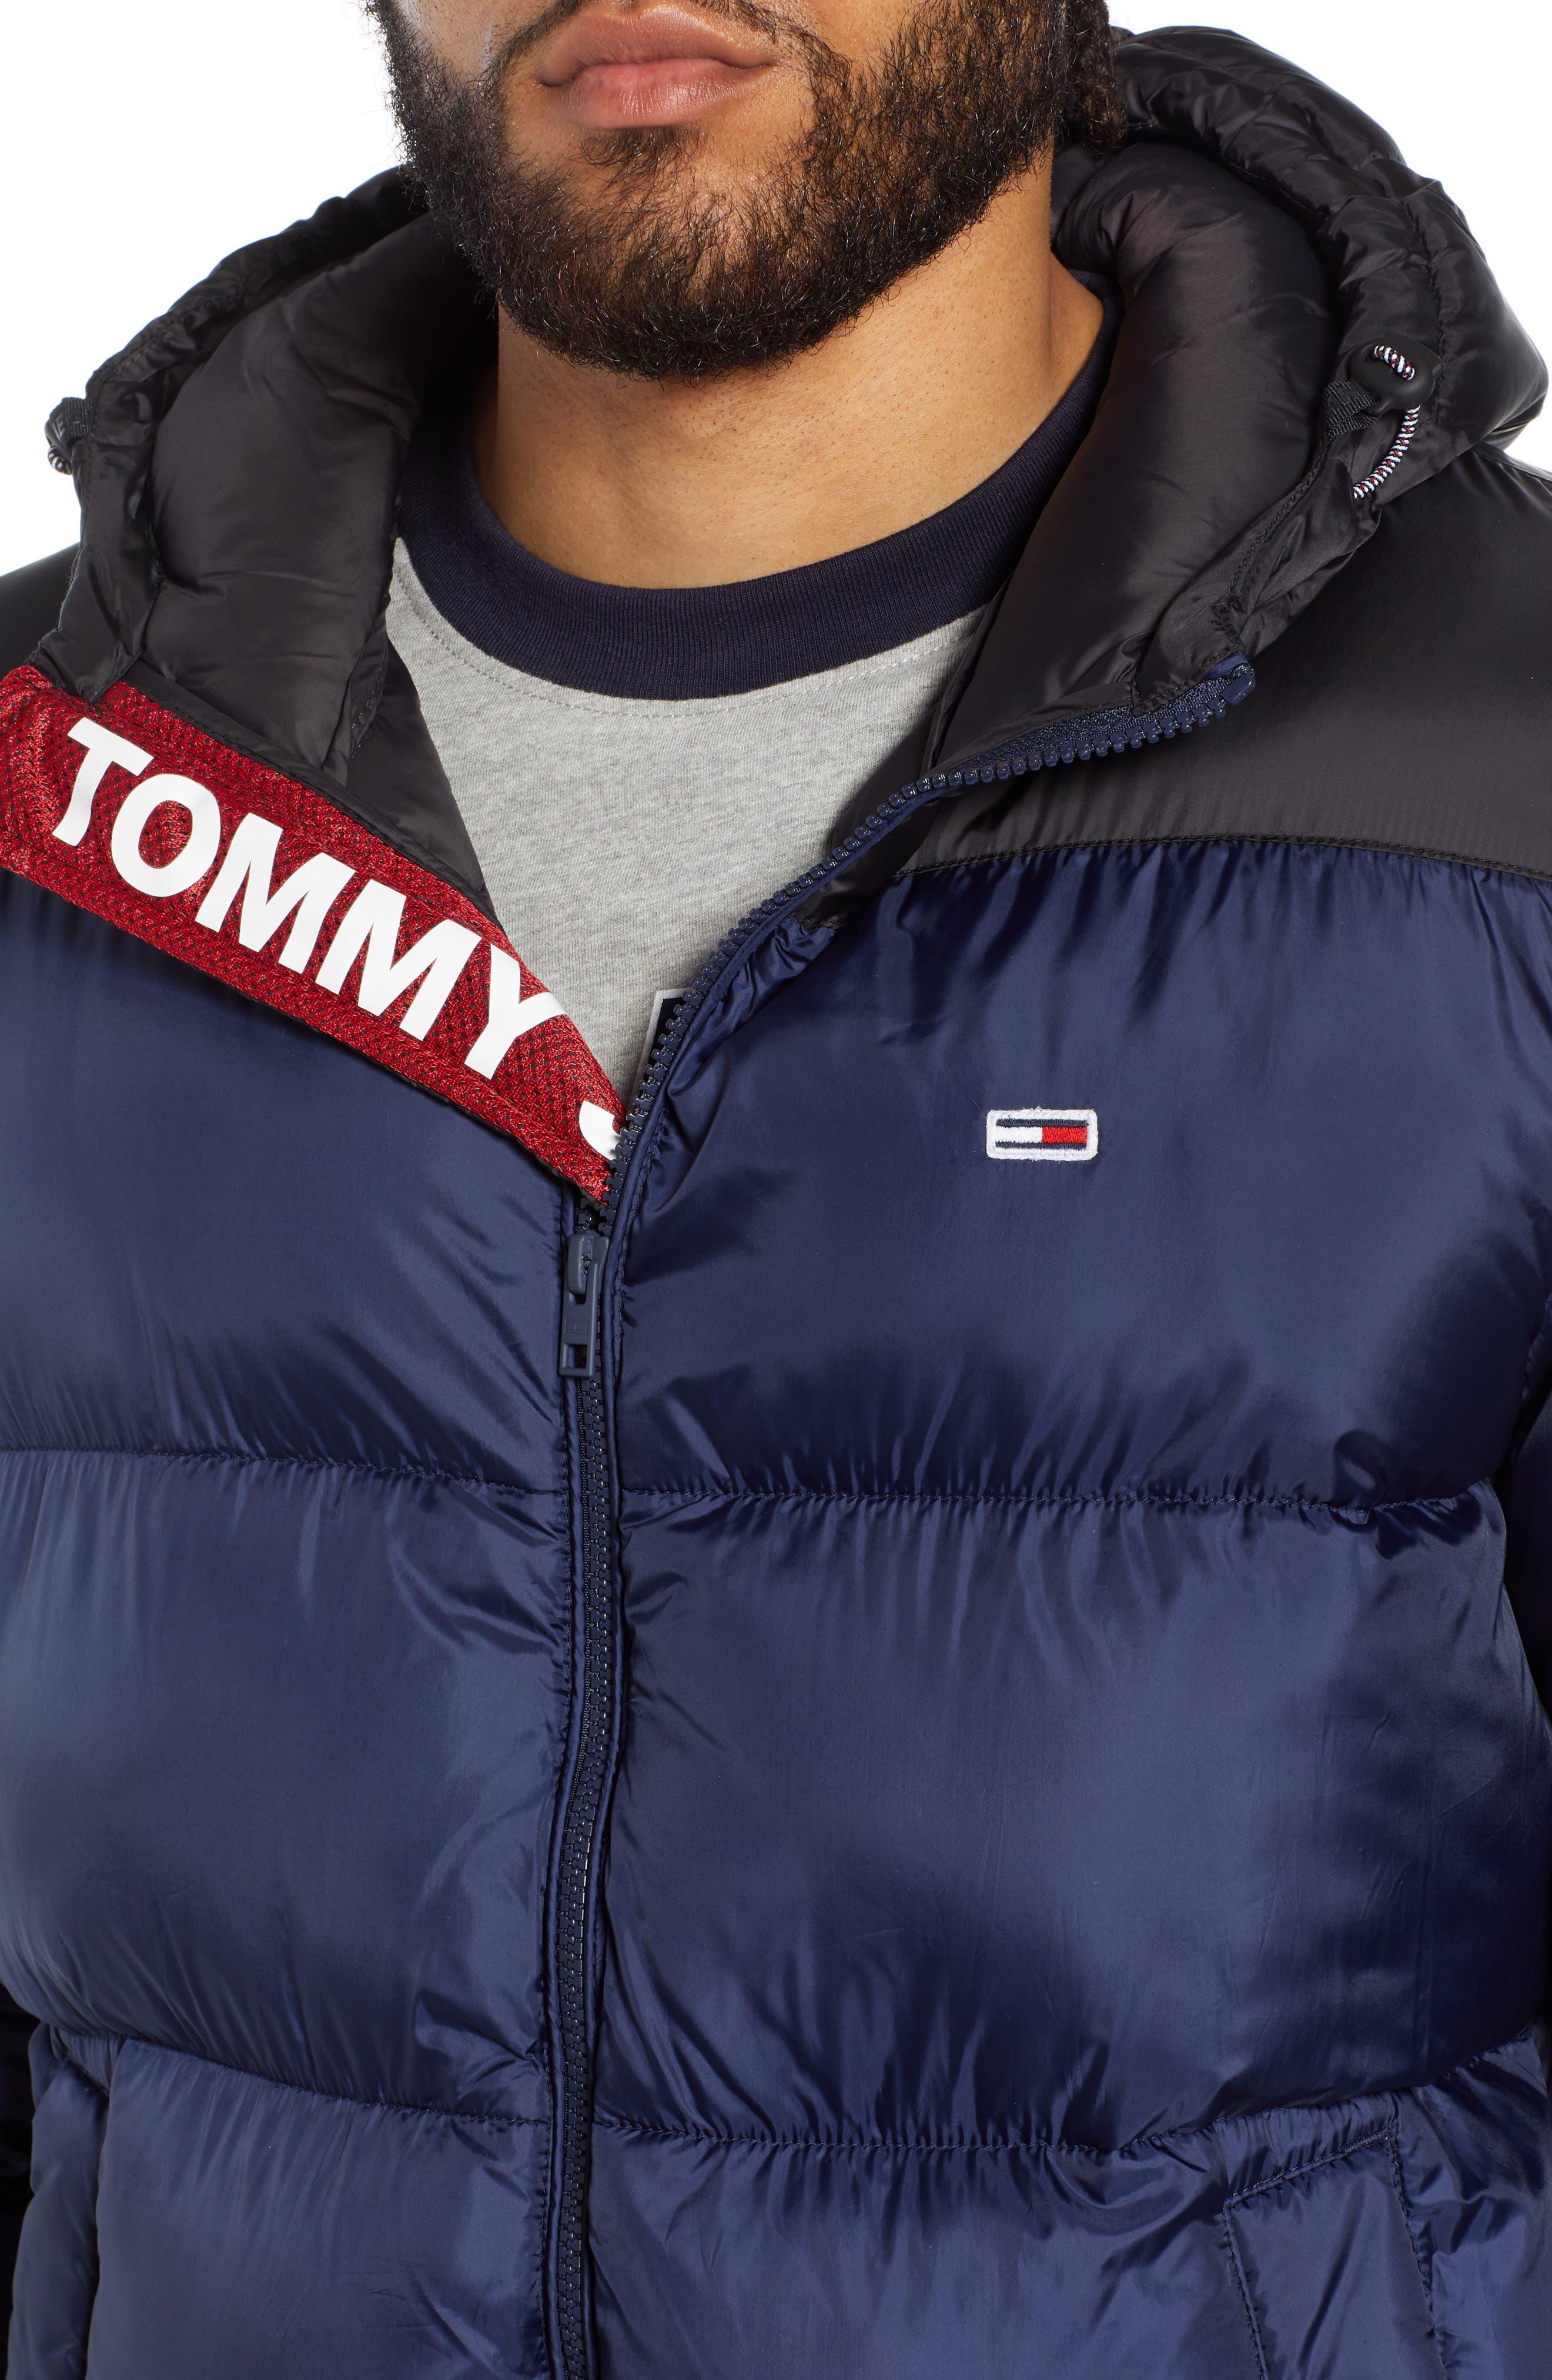 Classics Hooded Jacket,                             Alternate thumbnail 4, color,                             BLACK IRIS / TOMMY BLACK